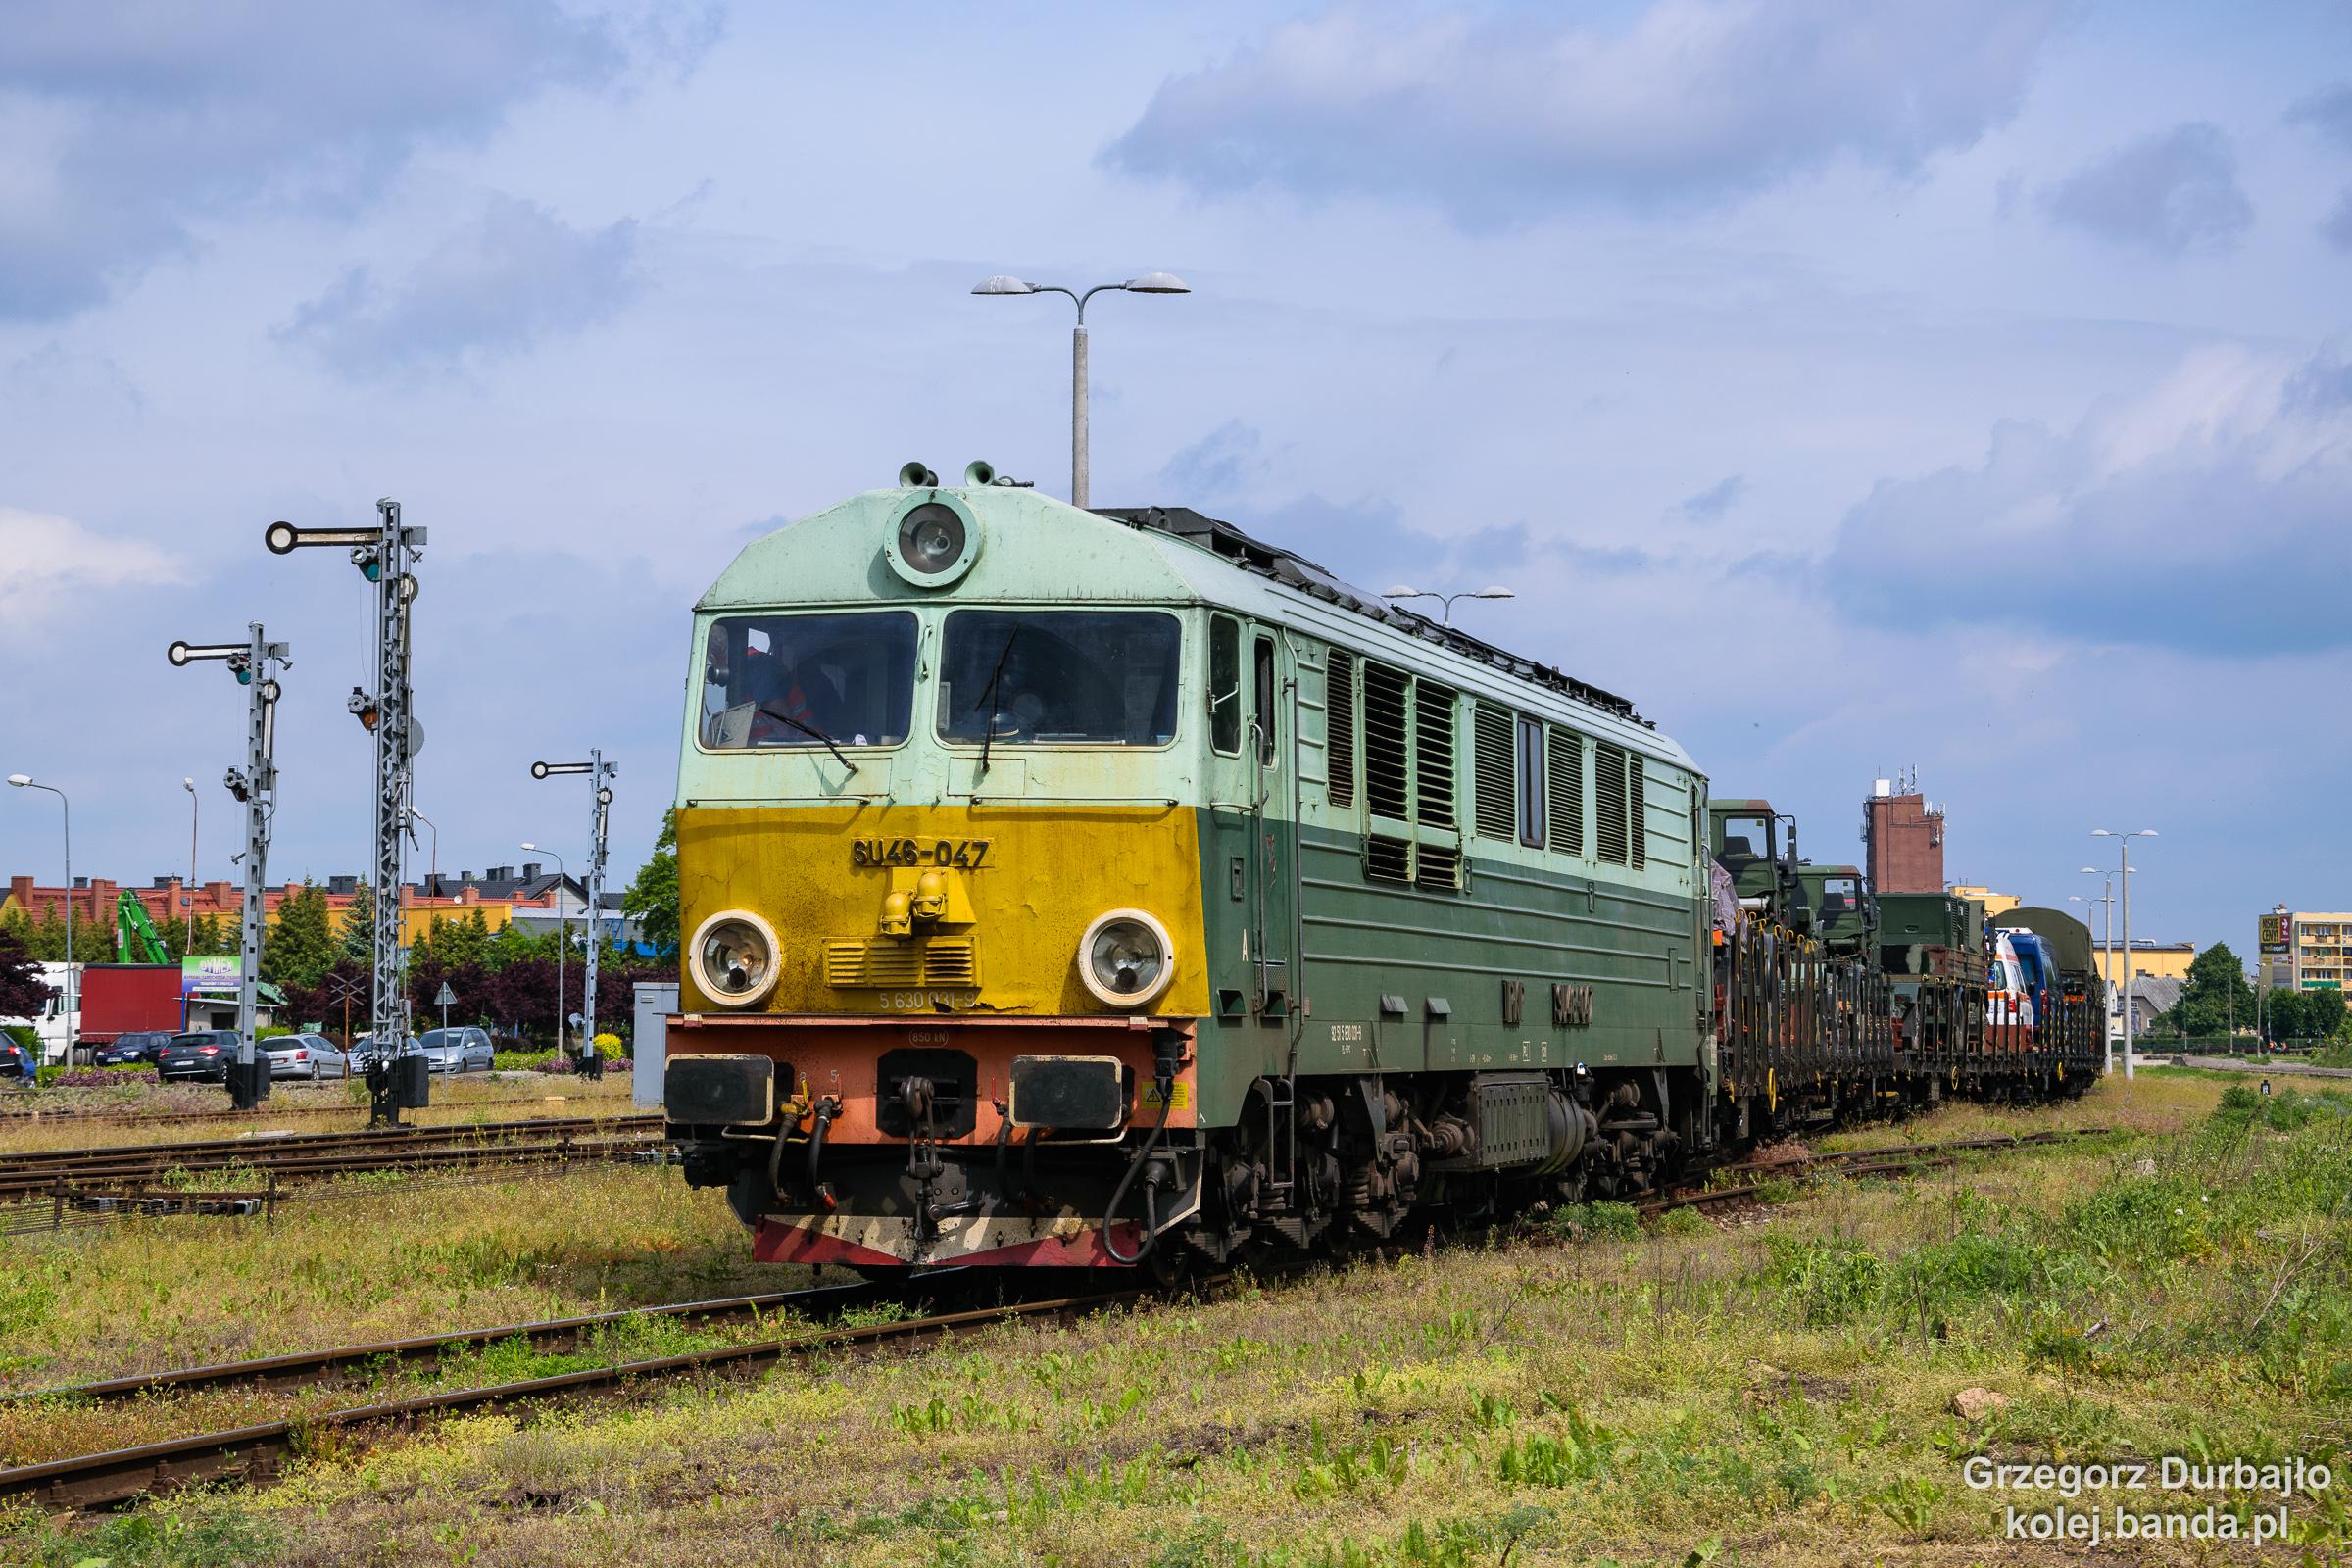 SU46-047